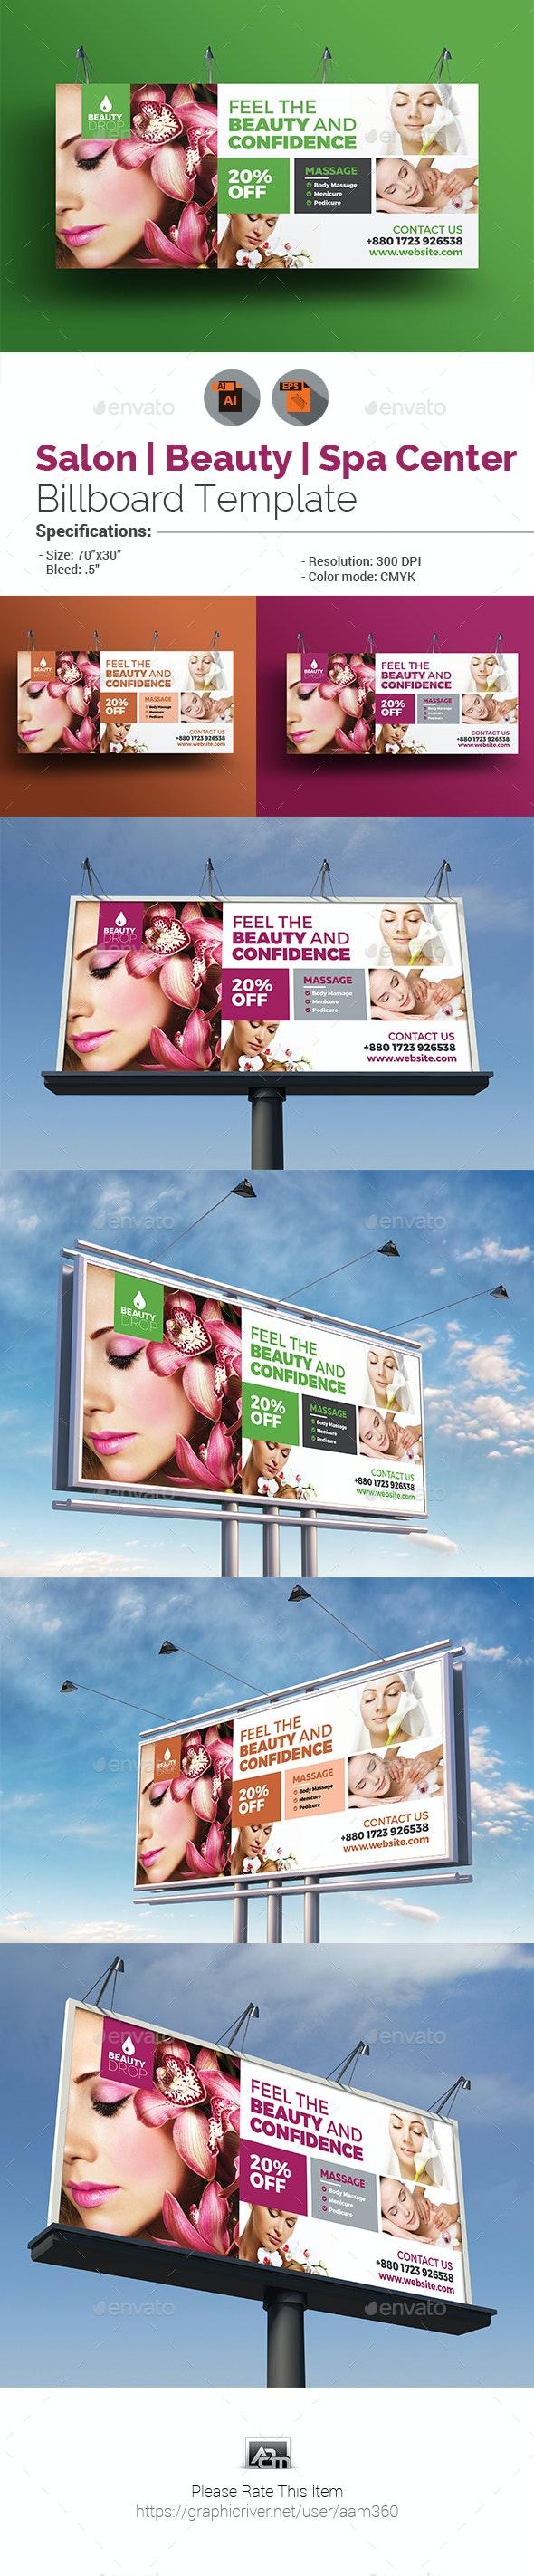 Spa & Beauty Care Billboard Template - Signage Print Templates